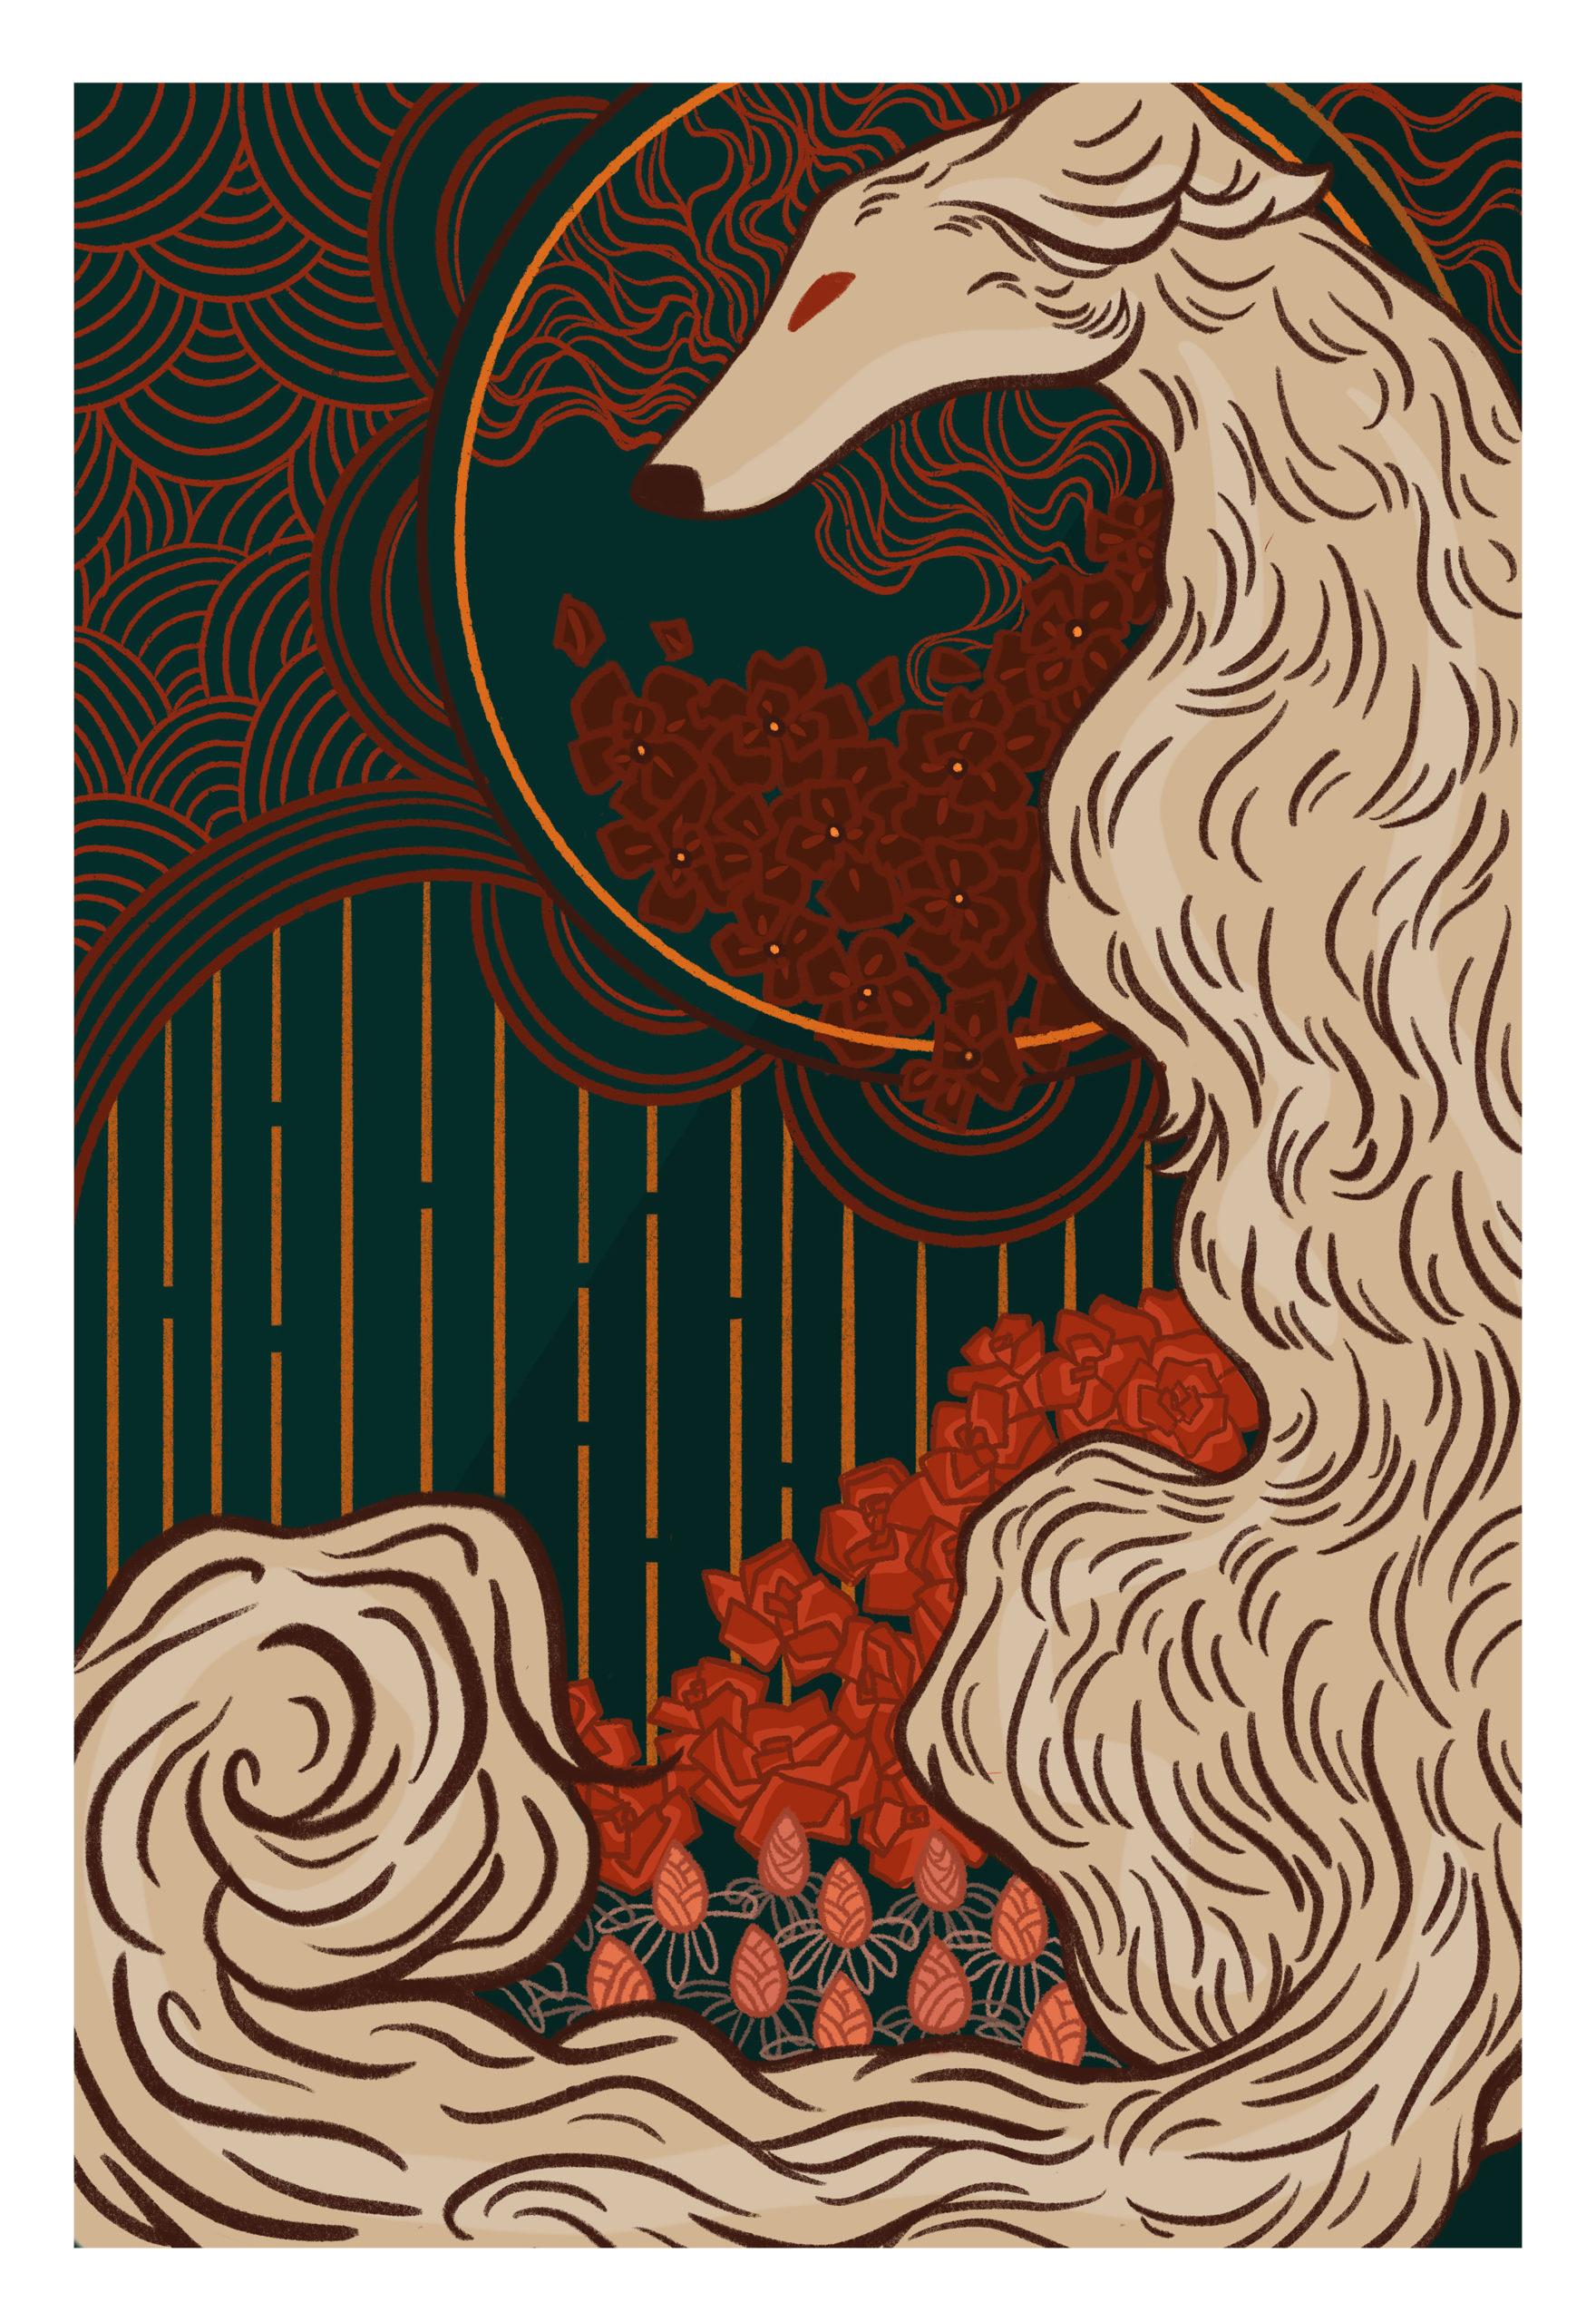 Vivaldi Four Seasons student artwork from MassArt, Cindy Lam